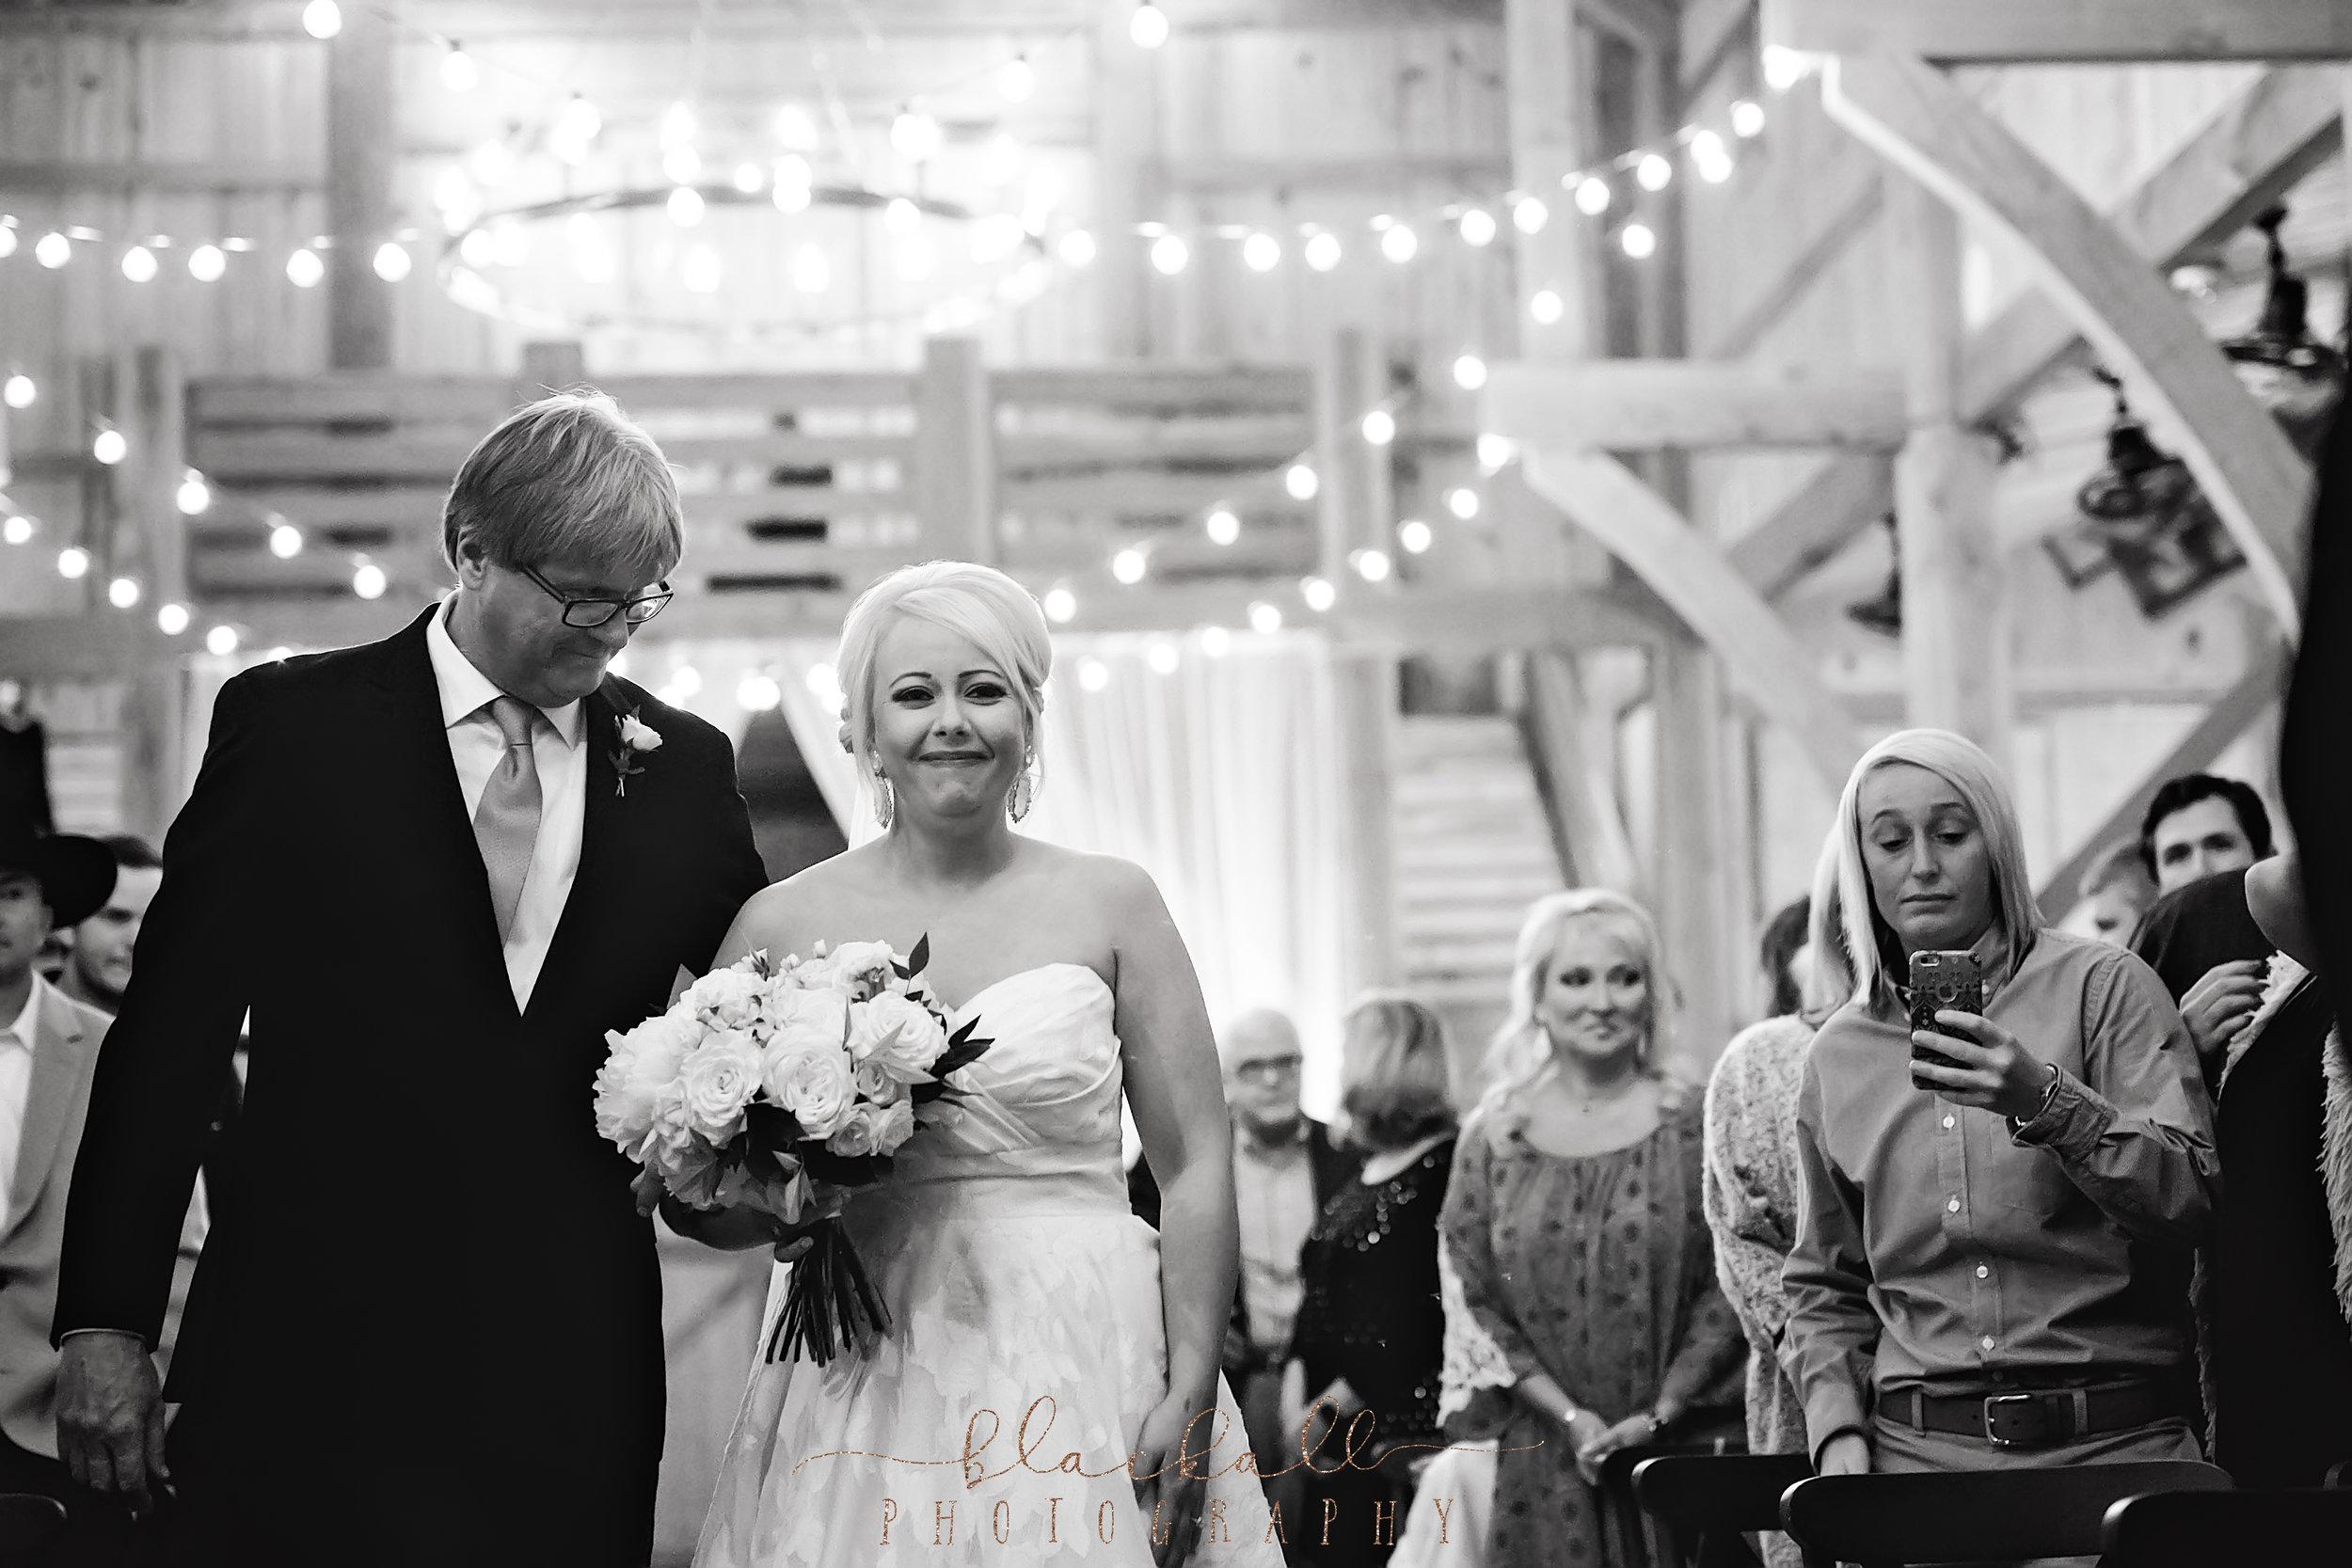 M&M WEDDING_Blackall Photography-37.JPG